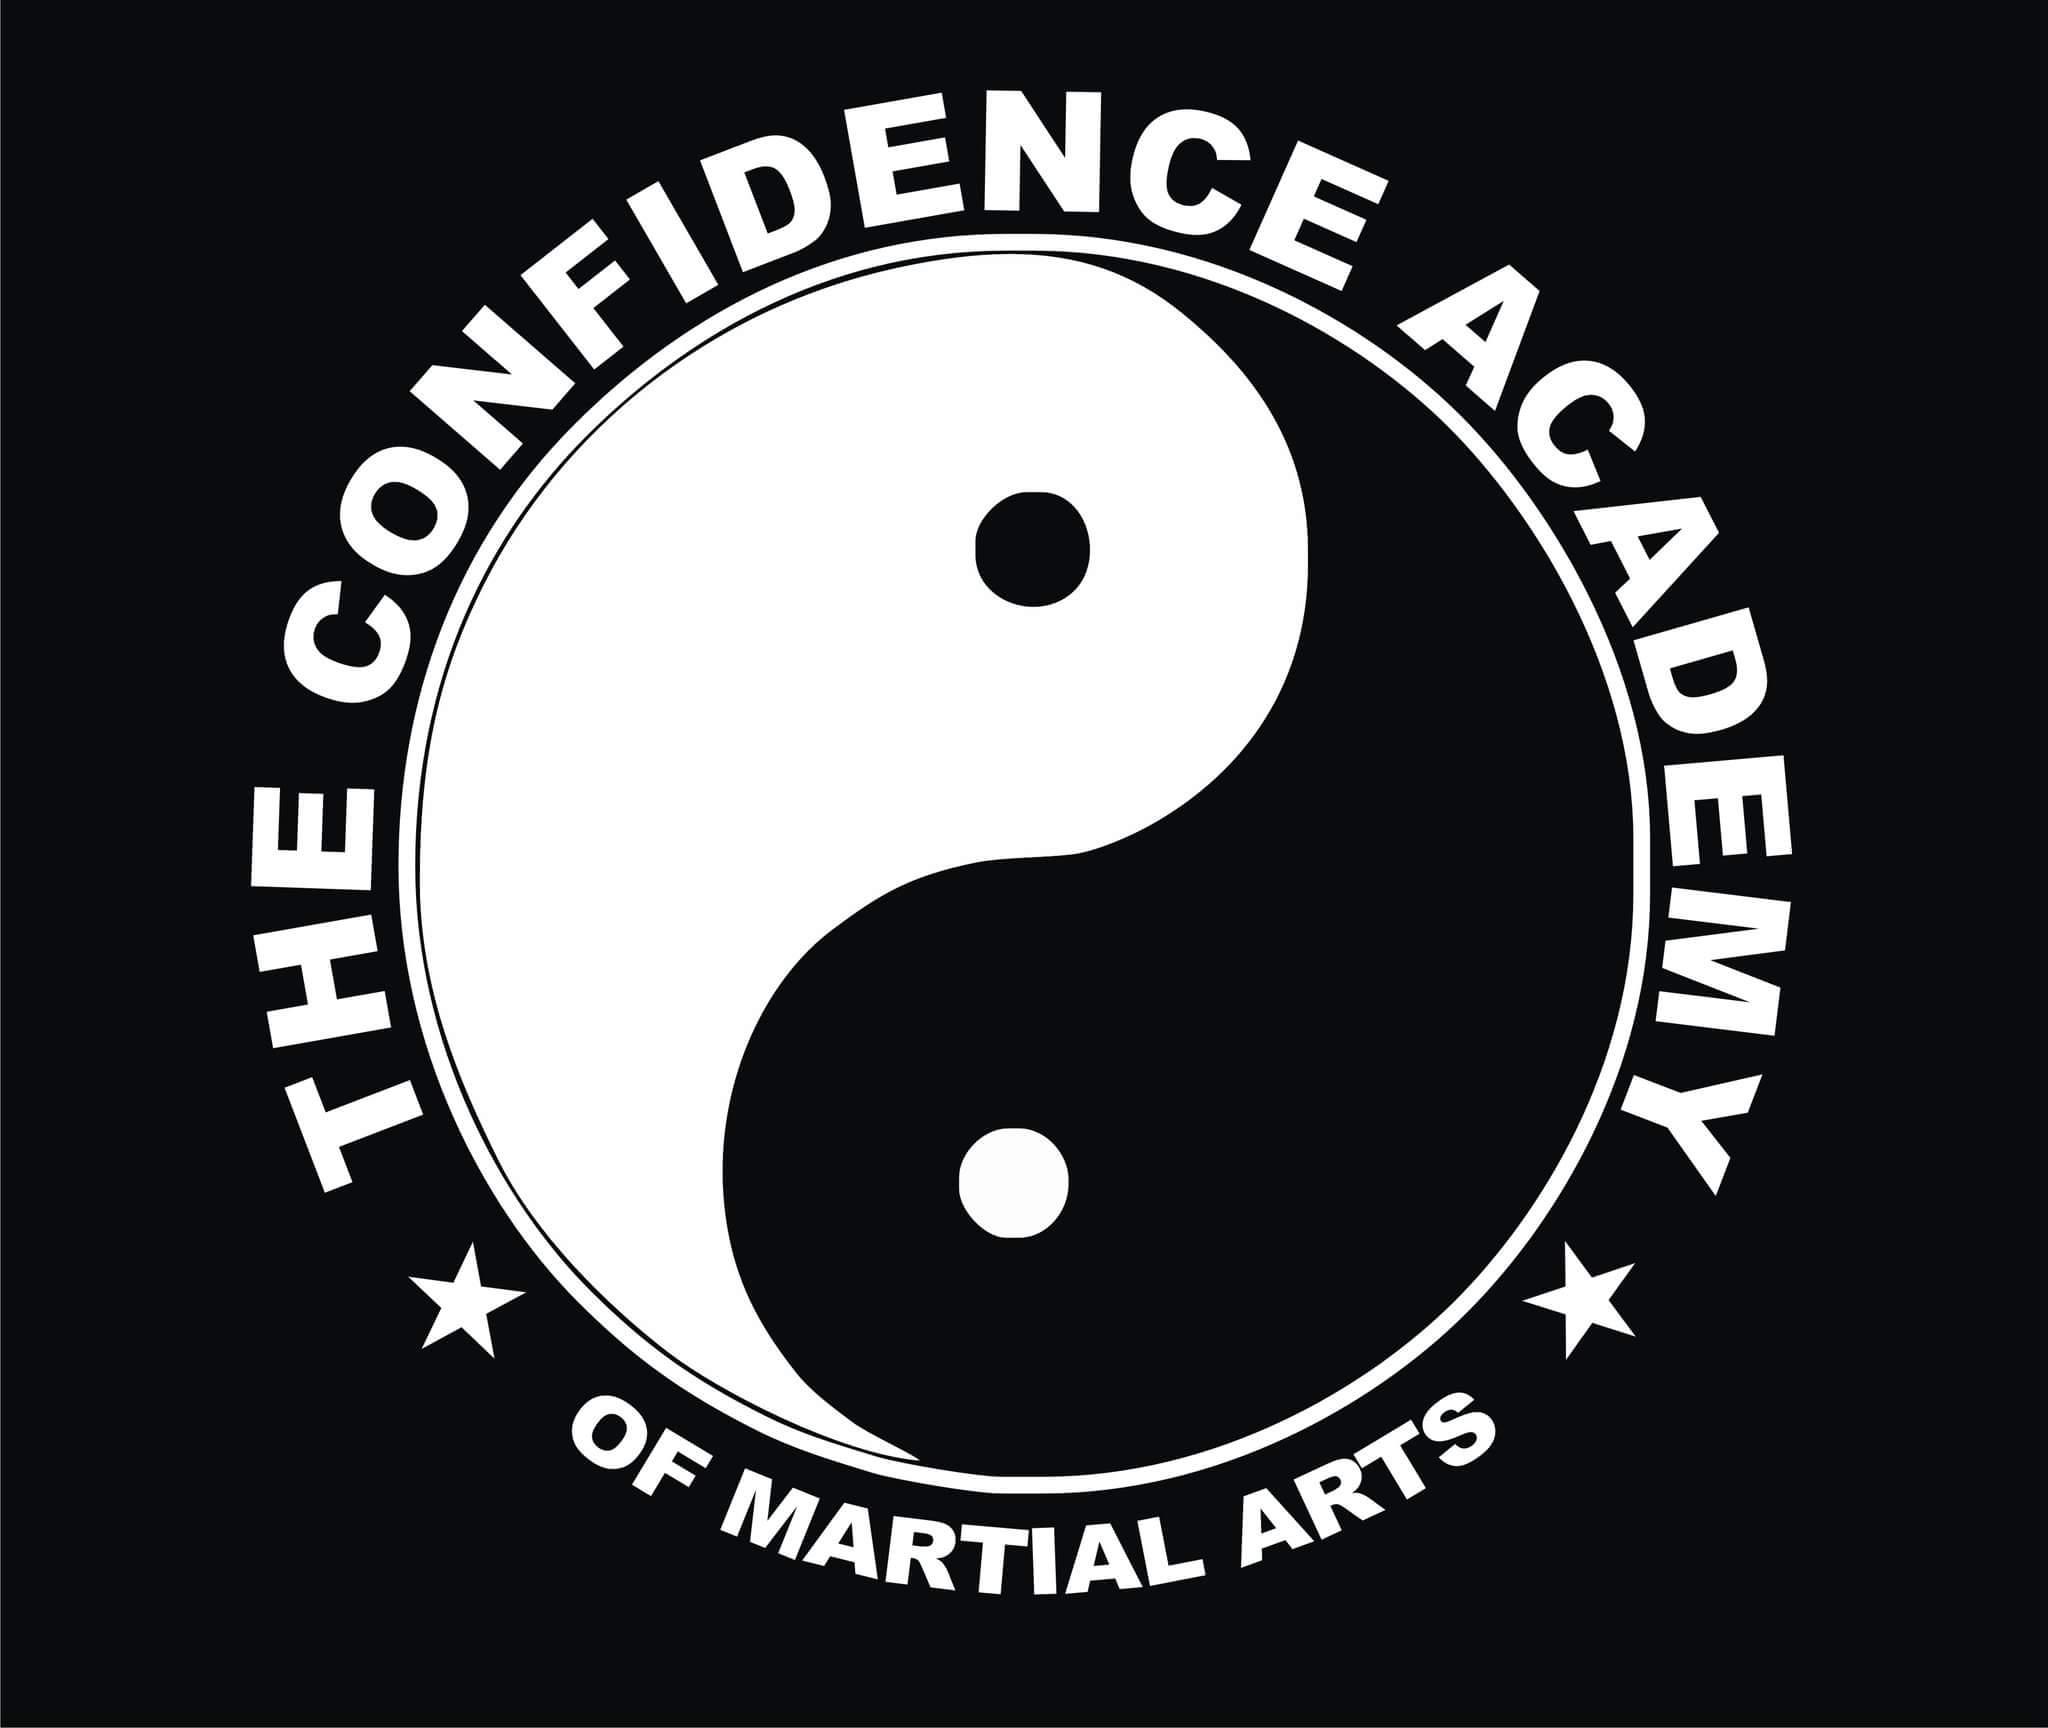 Confidence Academy of Martial Arts's logo